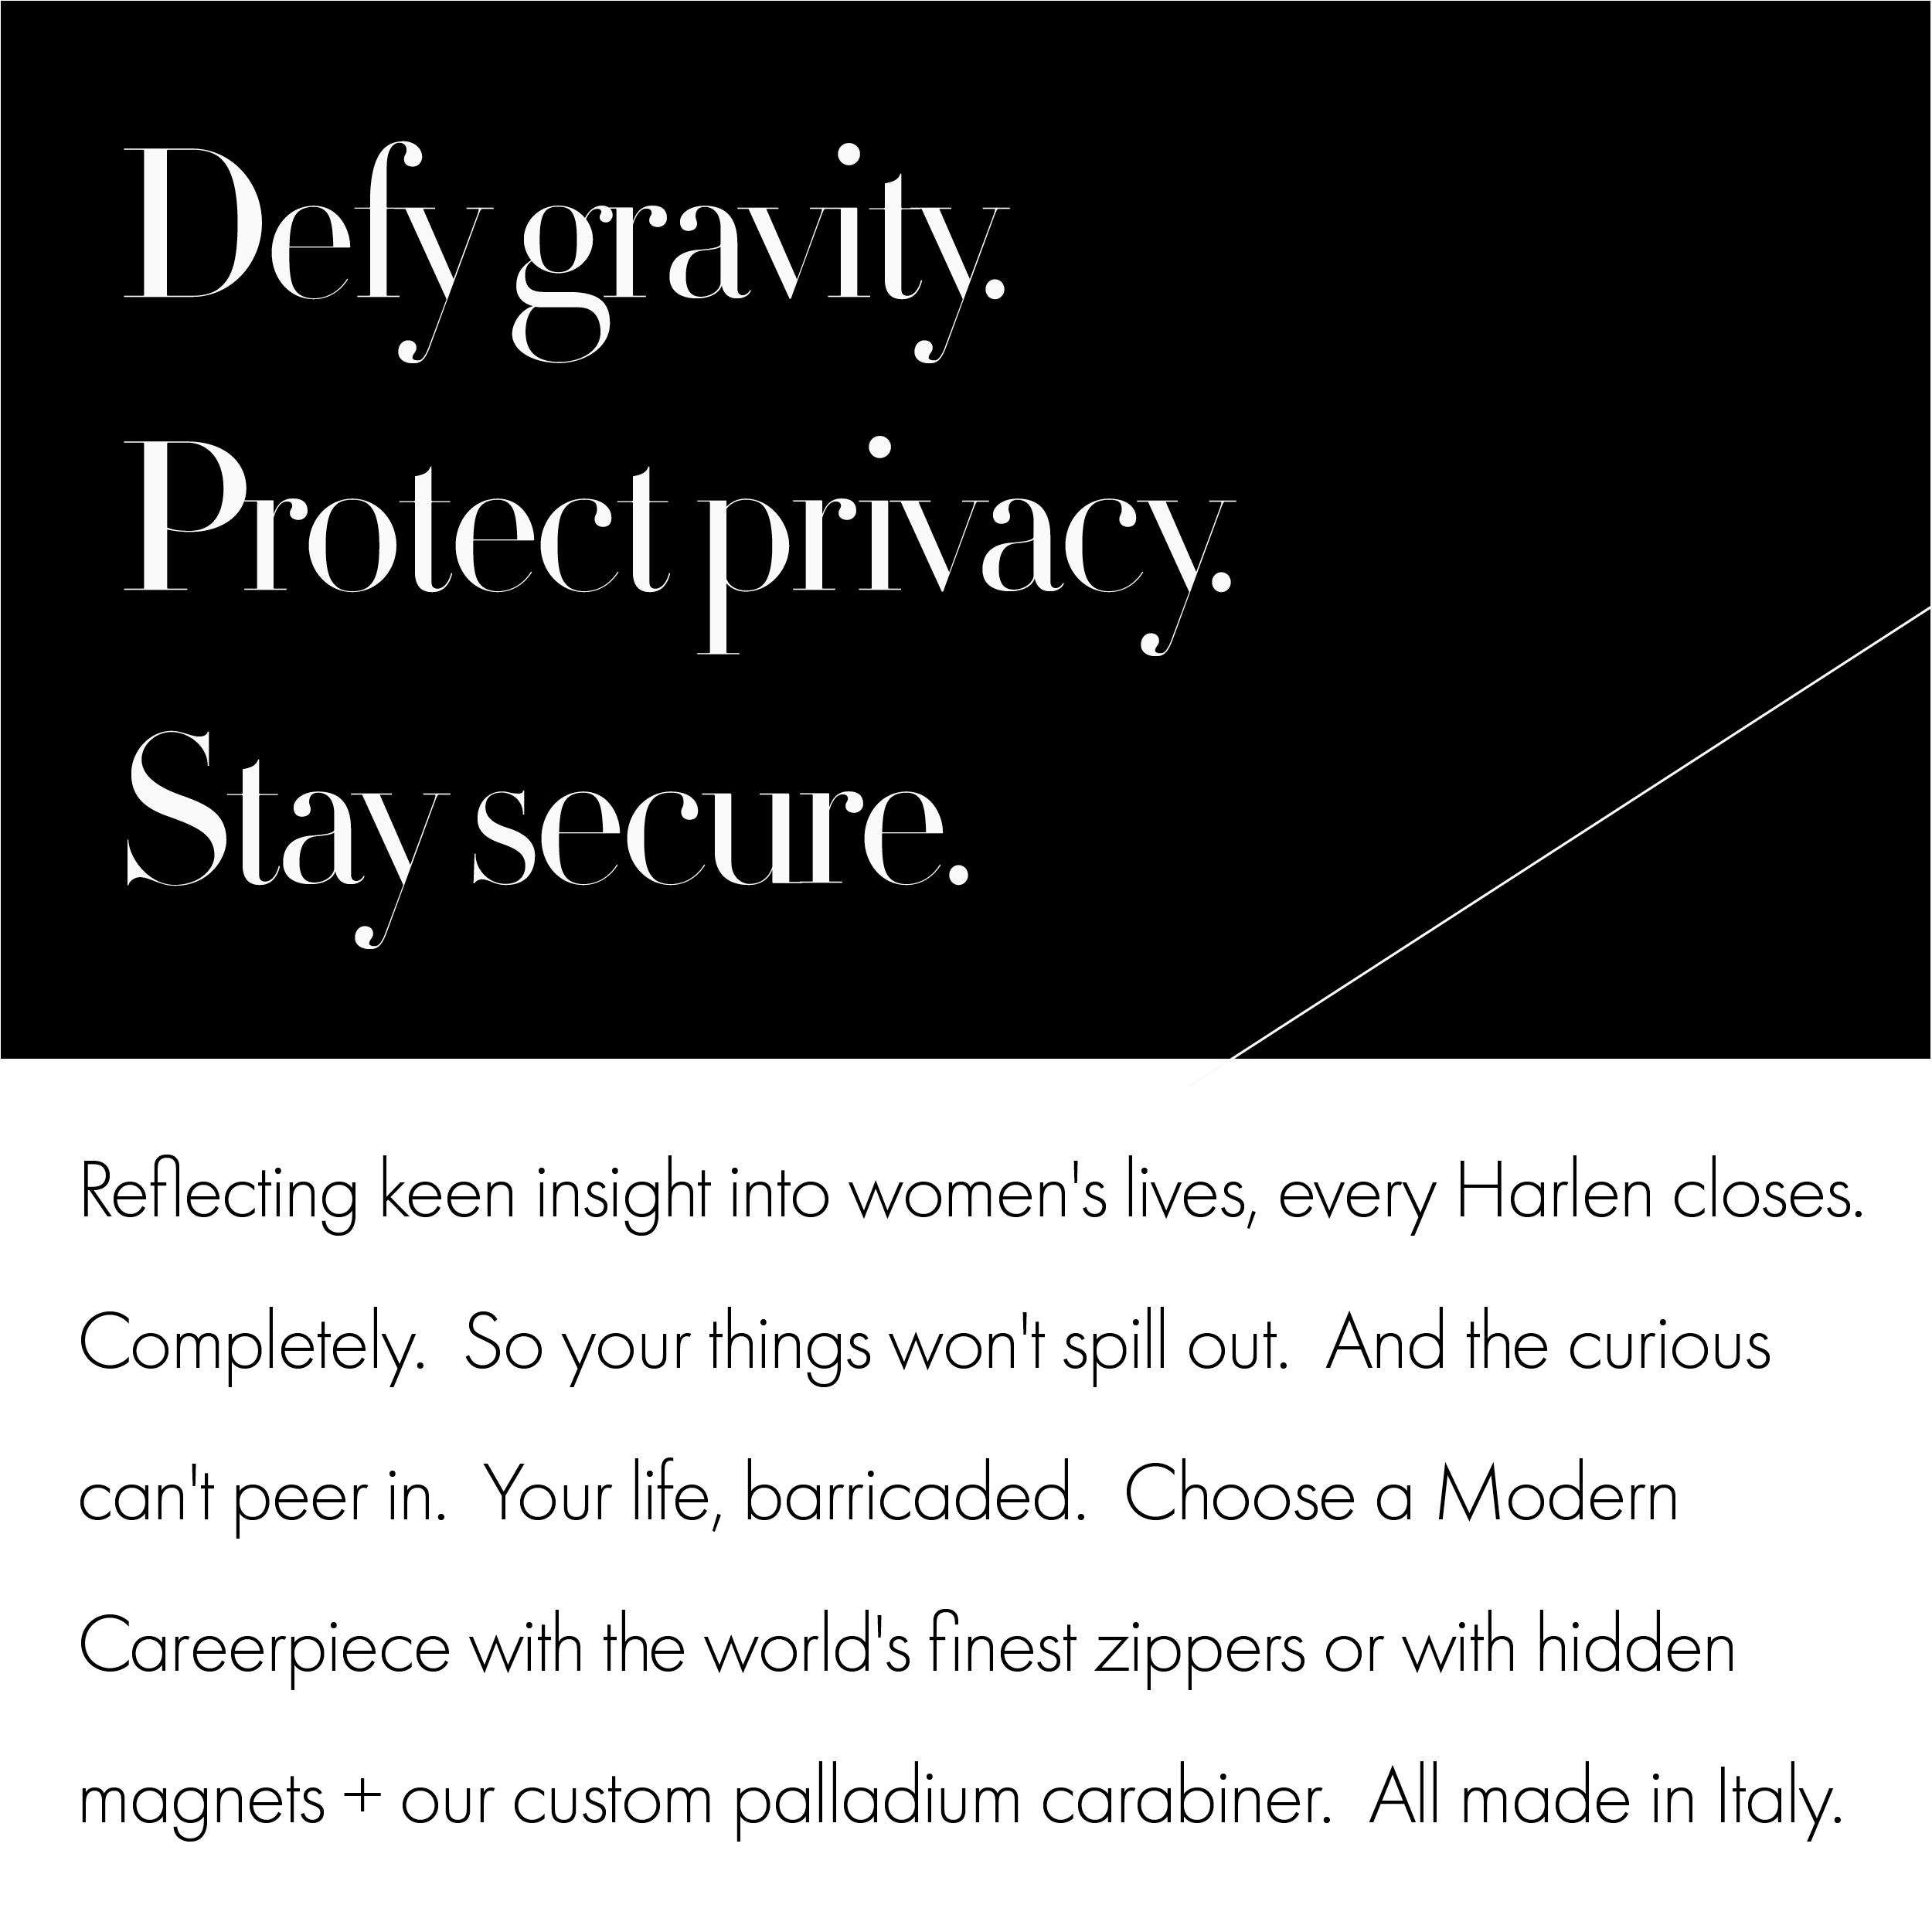 defy_gravity.png